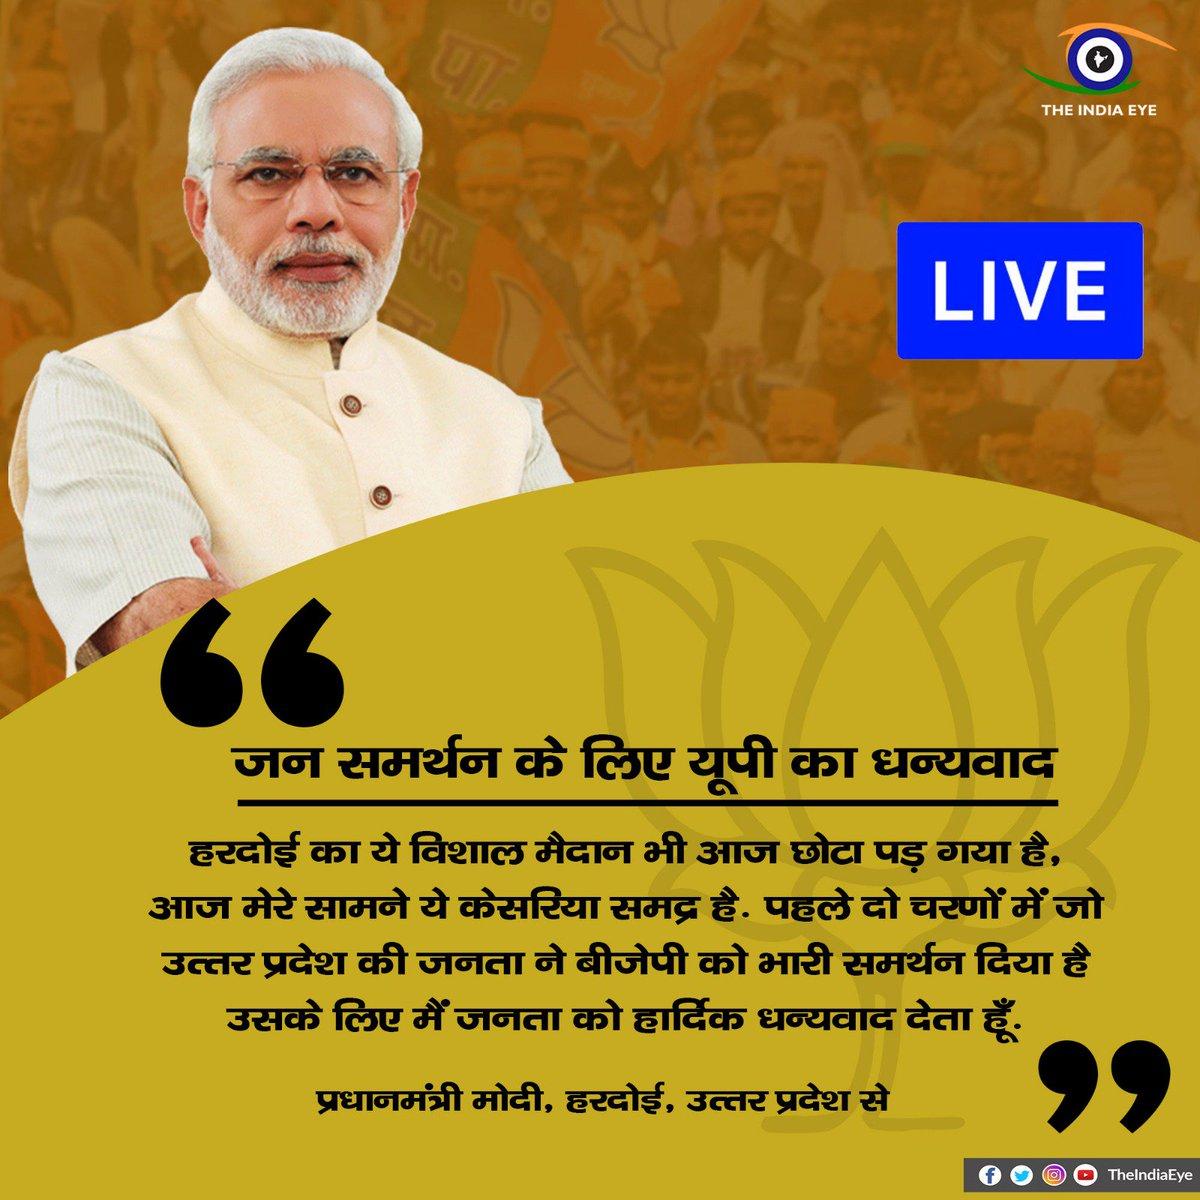 #भाजपा_लाओ_यूपी_बचाओ because #UttarPradesh is becoming #Criminal #heaven #rape #decoity #loot #Vote4BJP #vote17 #development<br>http://pic.twitter.com/N9sDPPXLoB